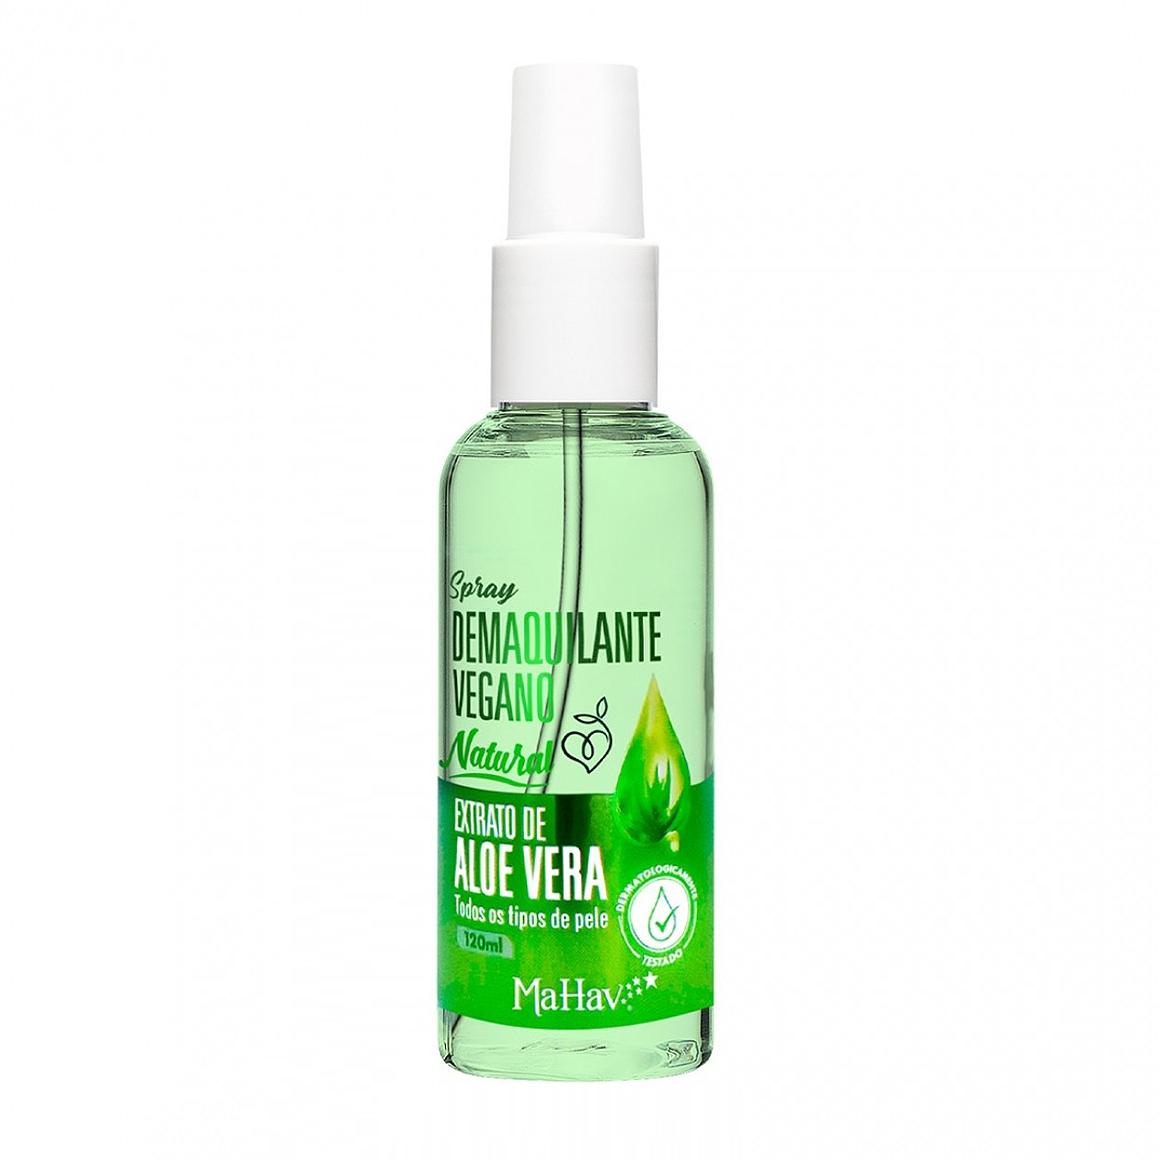 Mahav Spray Demaquilante Vegano Natural